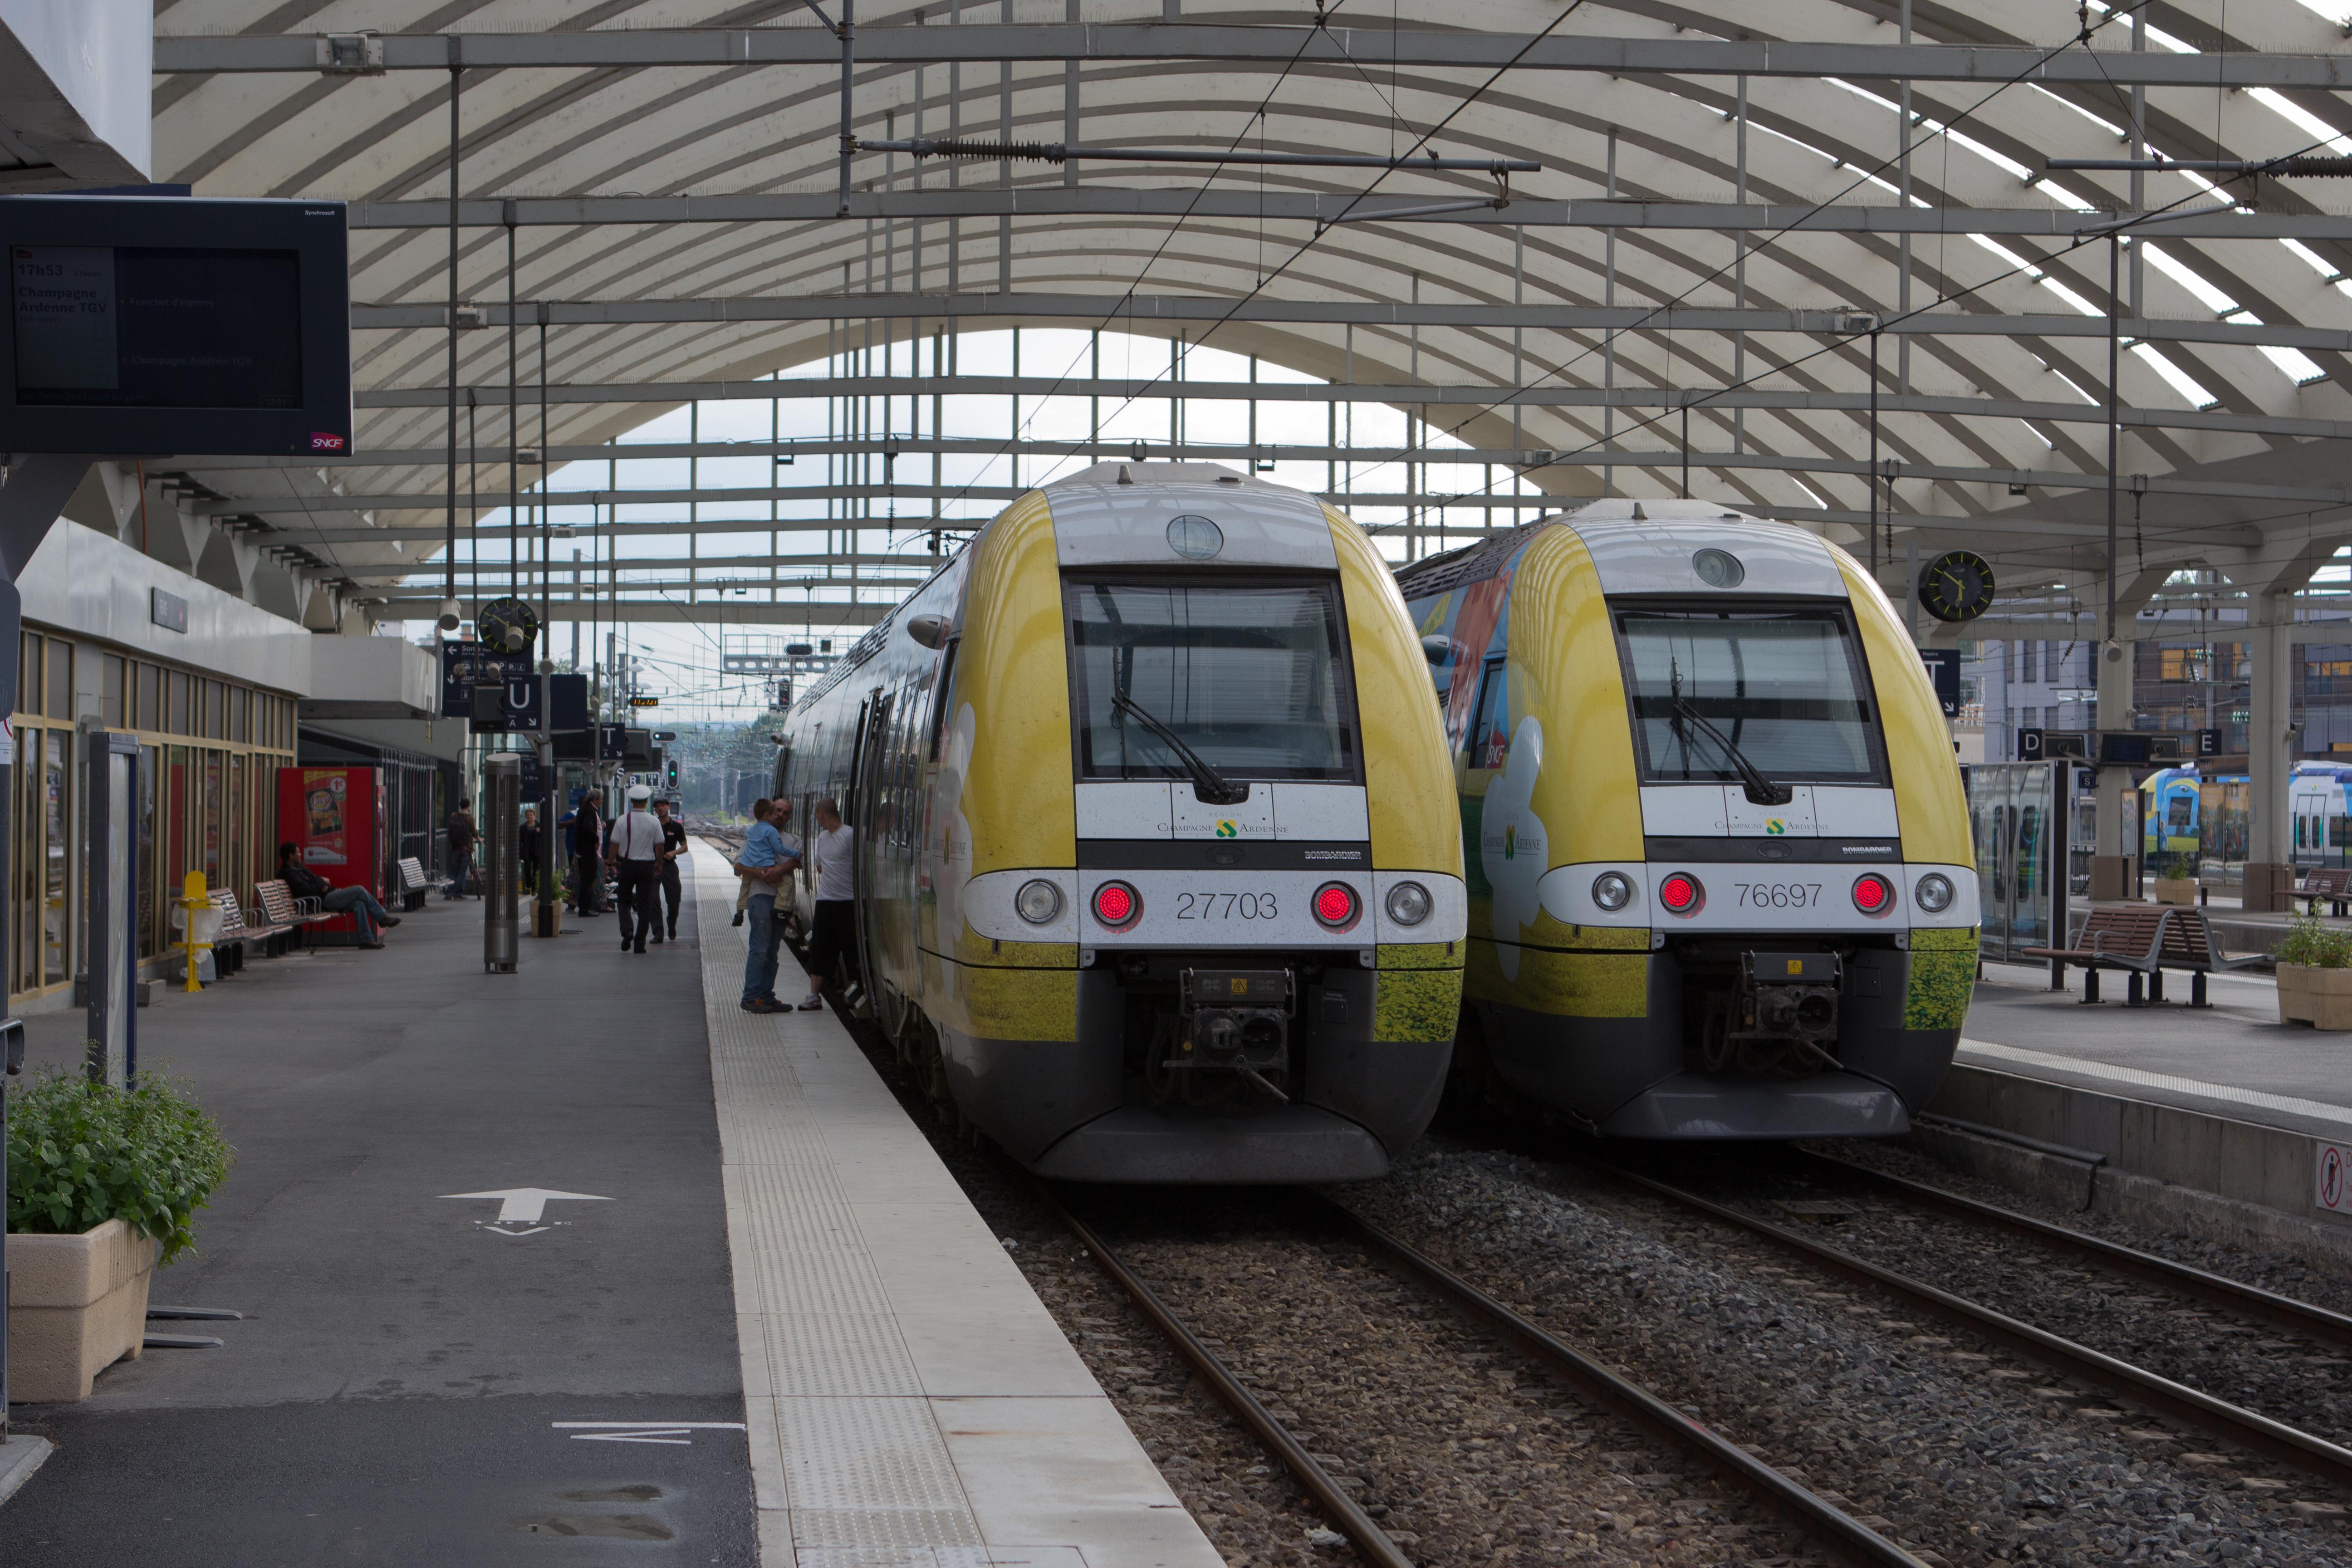 File:Gare de Reims - IMG 2379.jpg